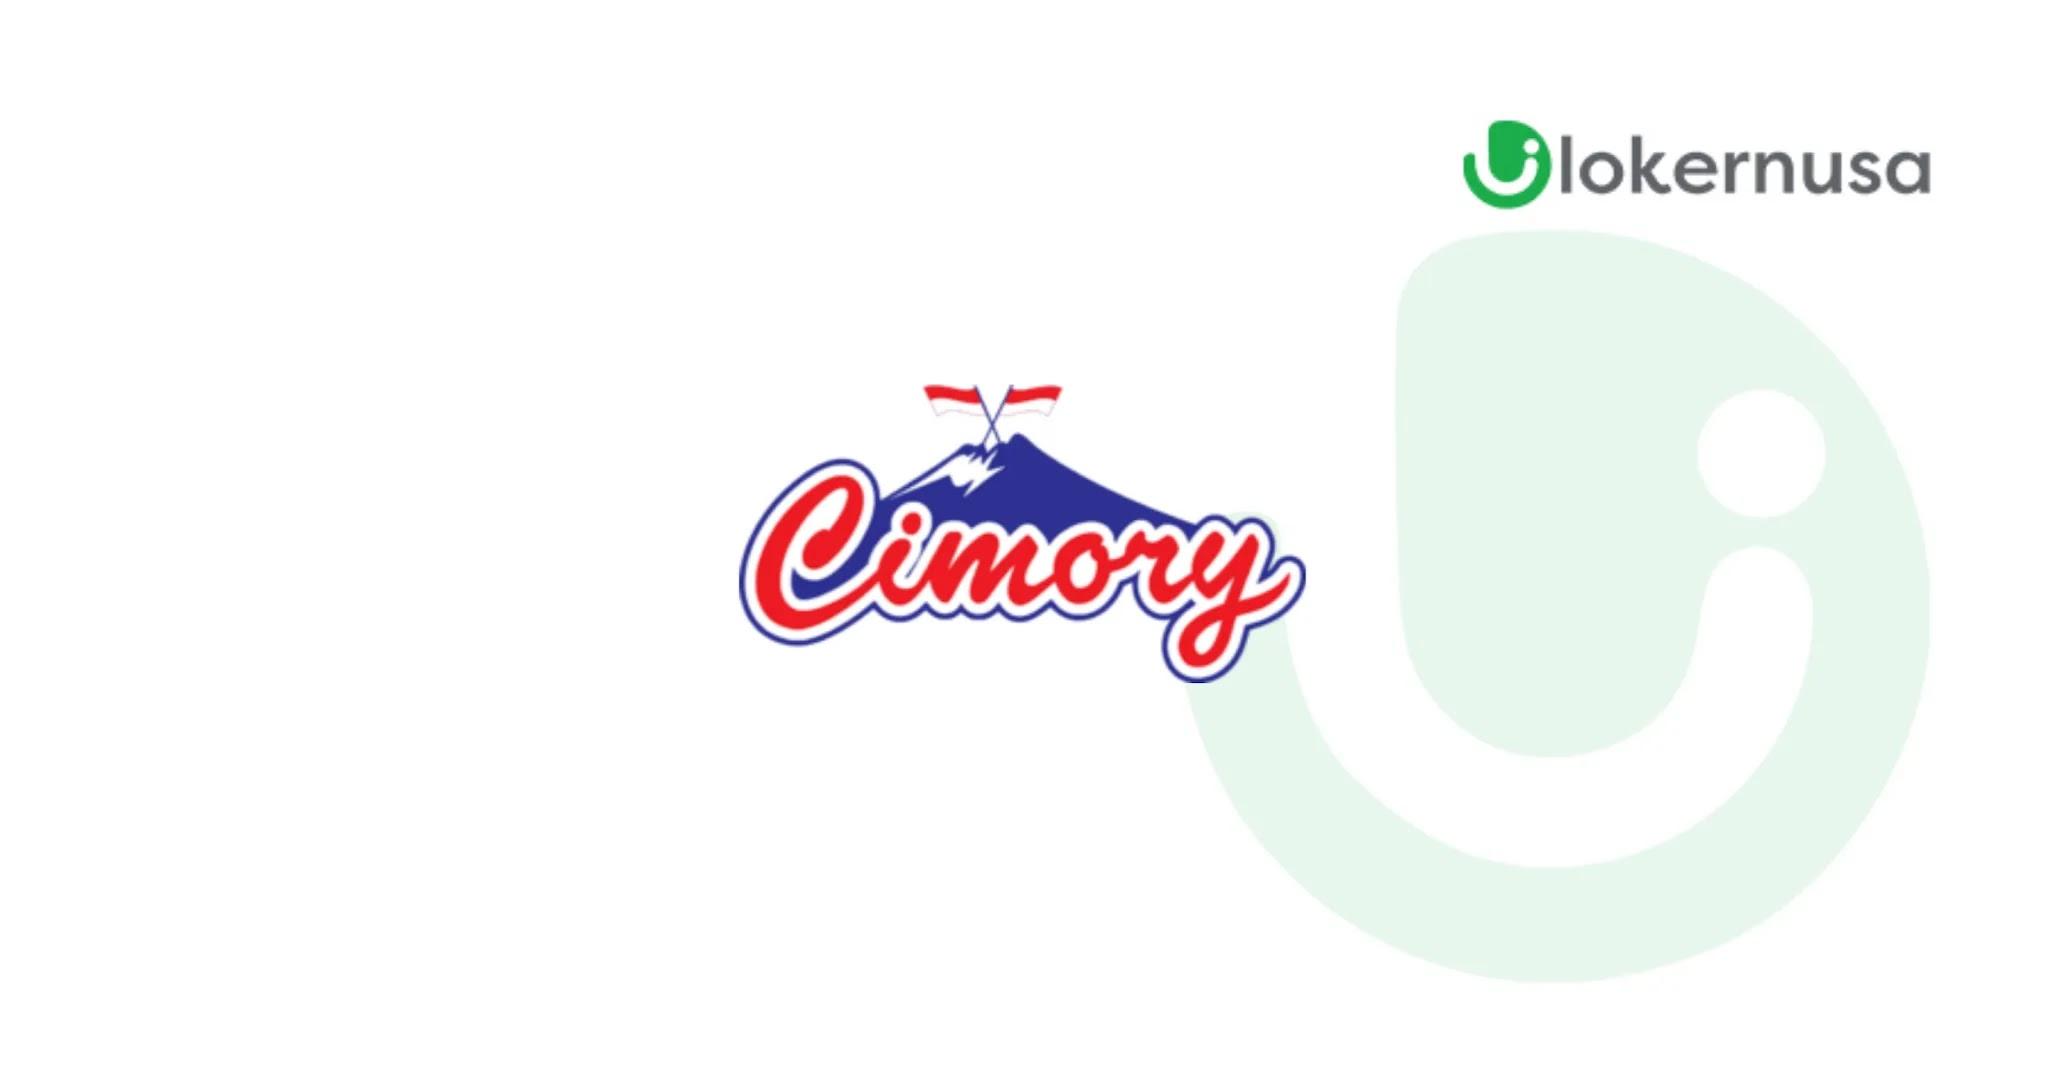 Lowongan Kerja Cimory